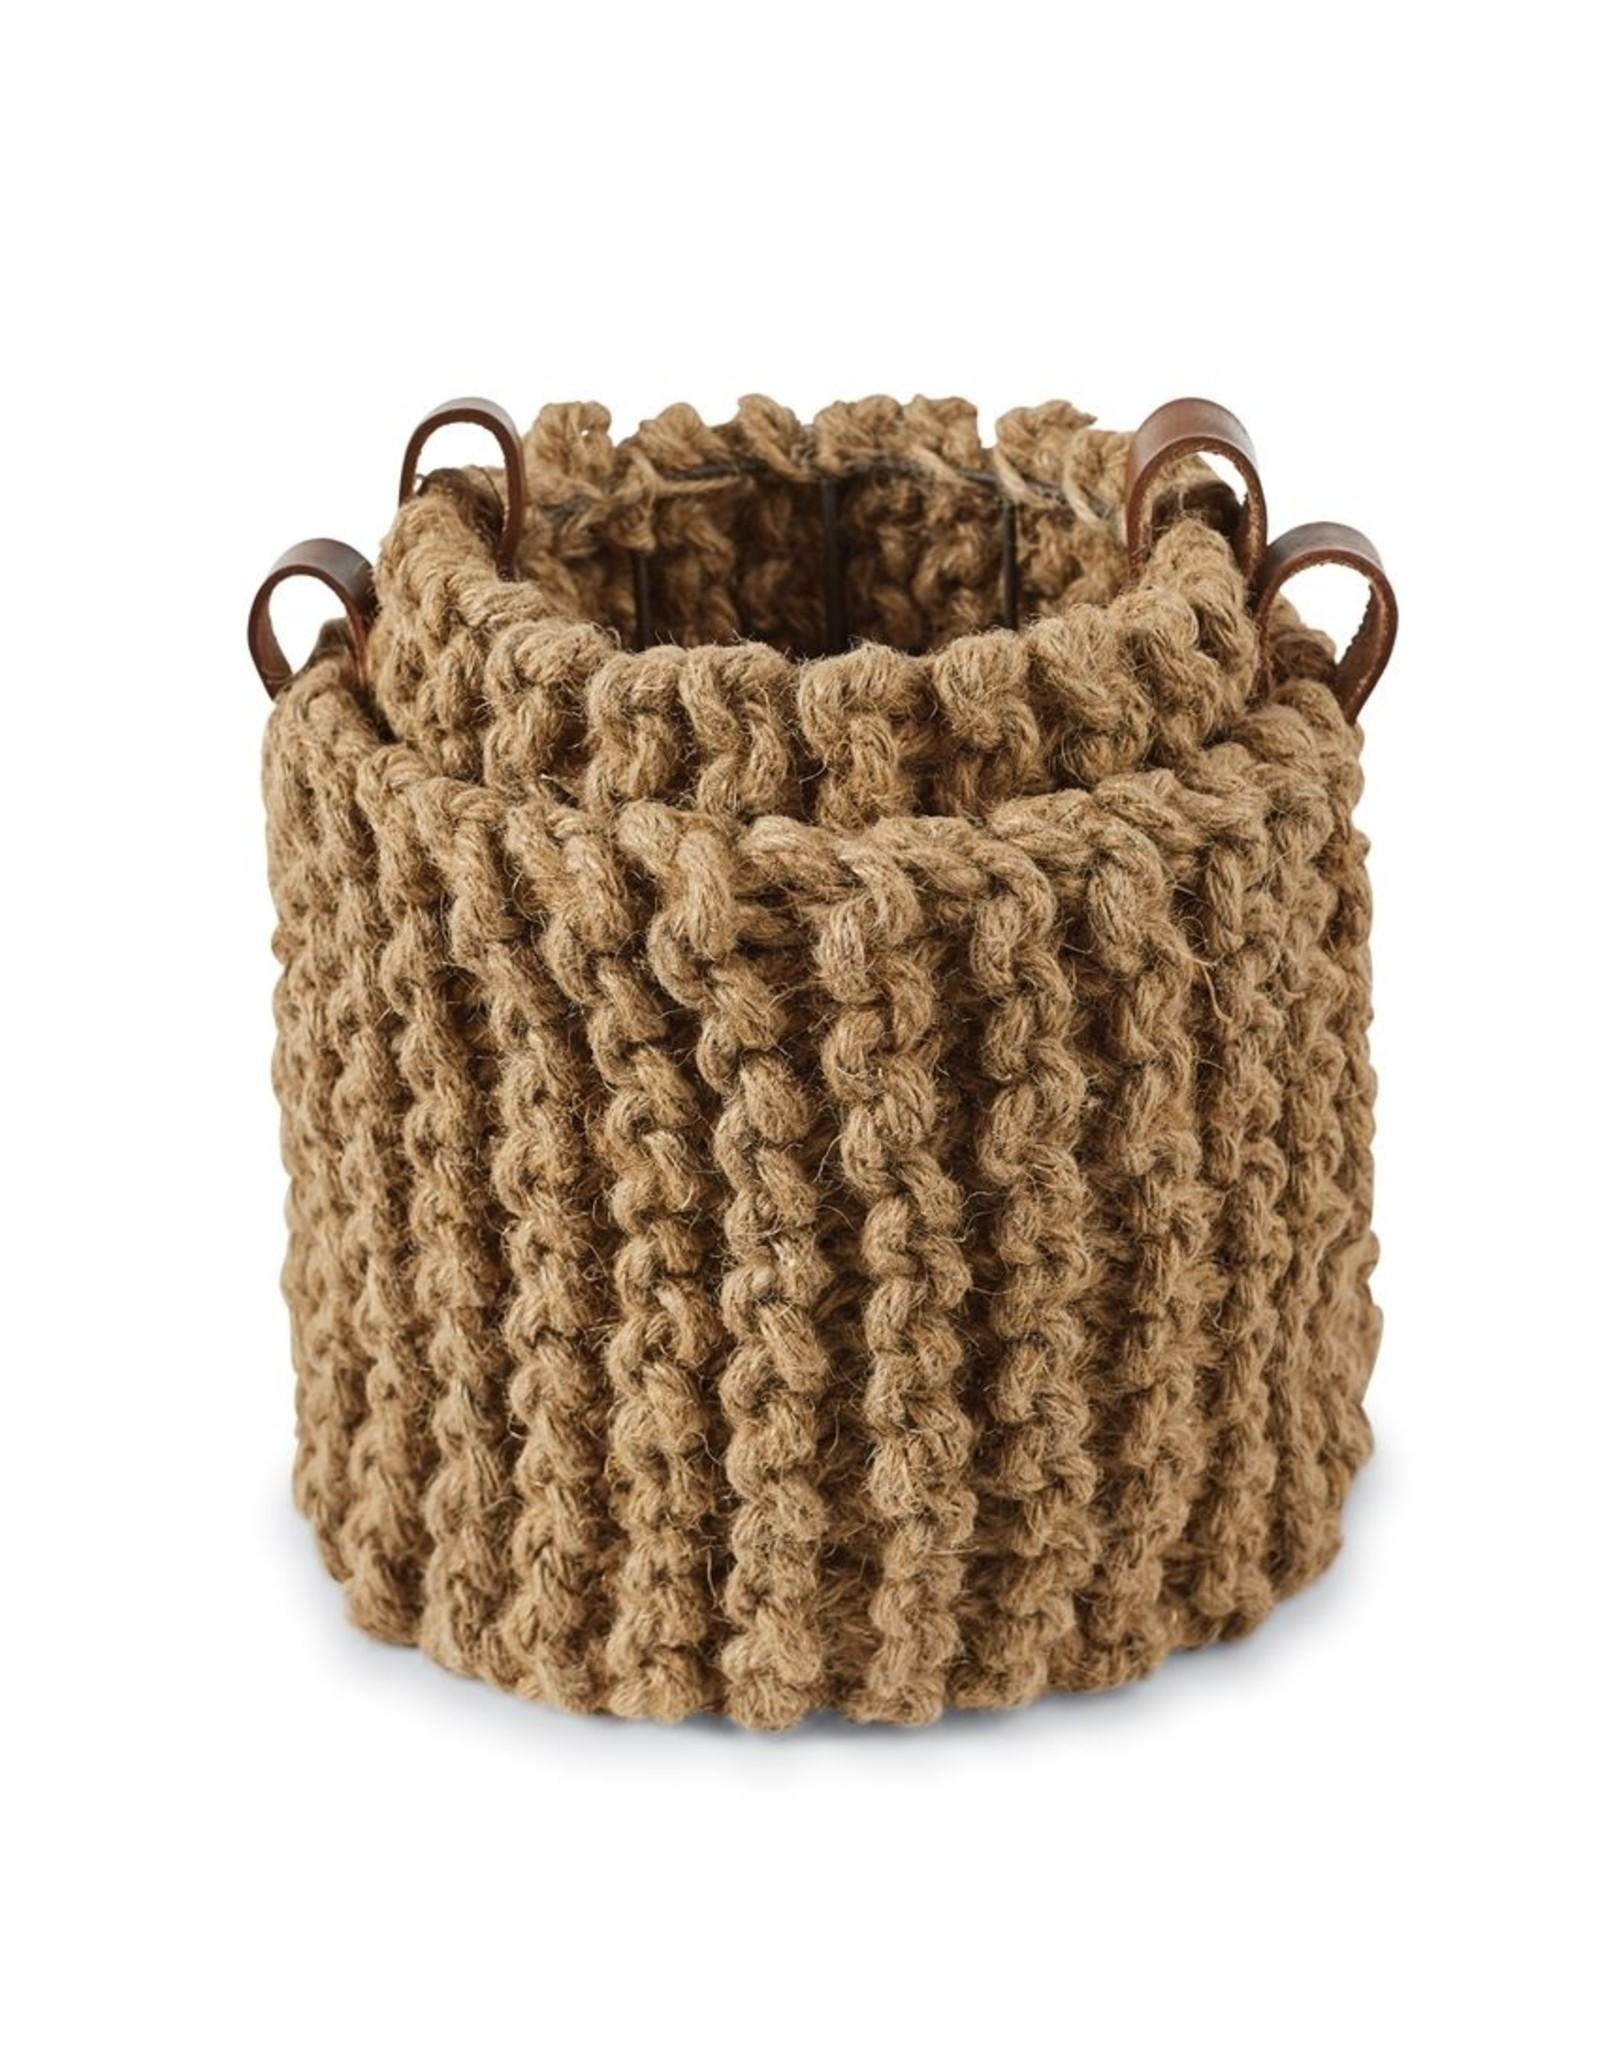 MudPie Jute Pote  Basket - small